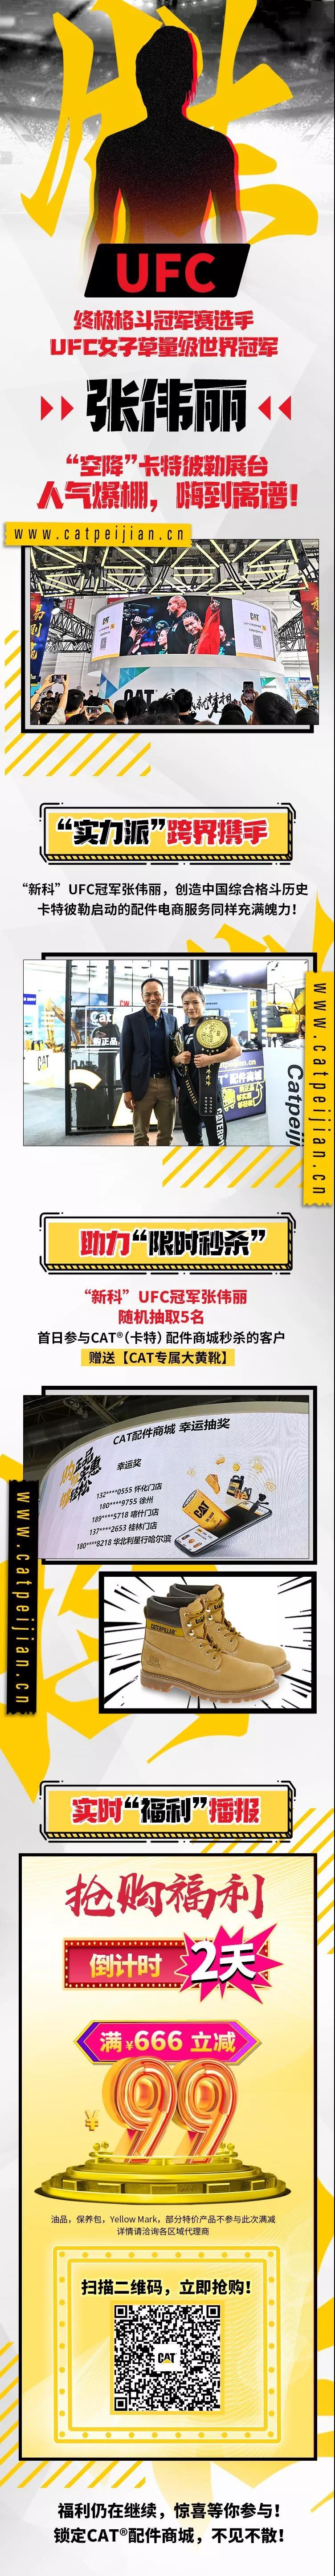 UFC世界冠军张伟丽助力CAT®(卡特)配件商城秒杀活动!